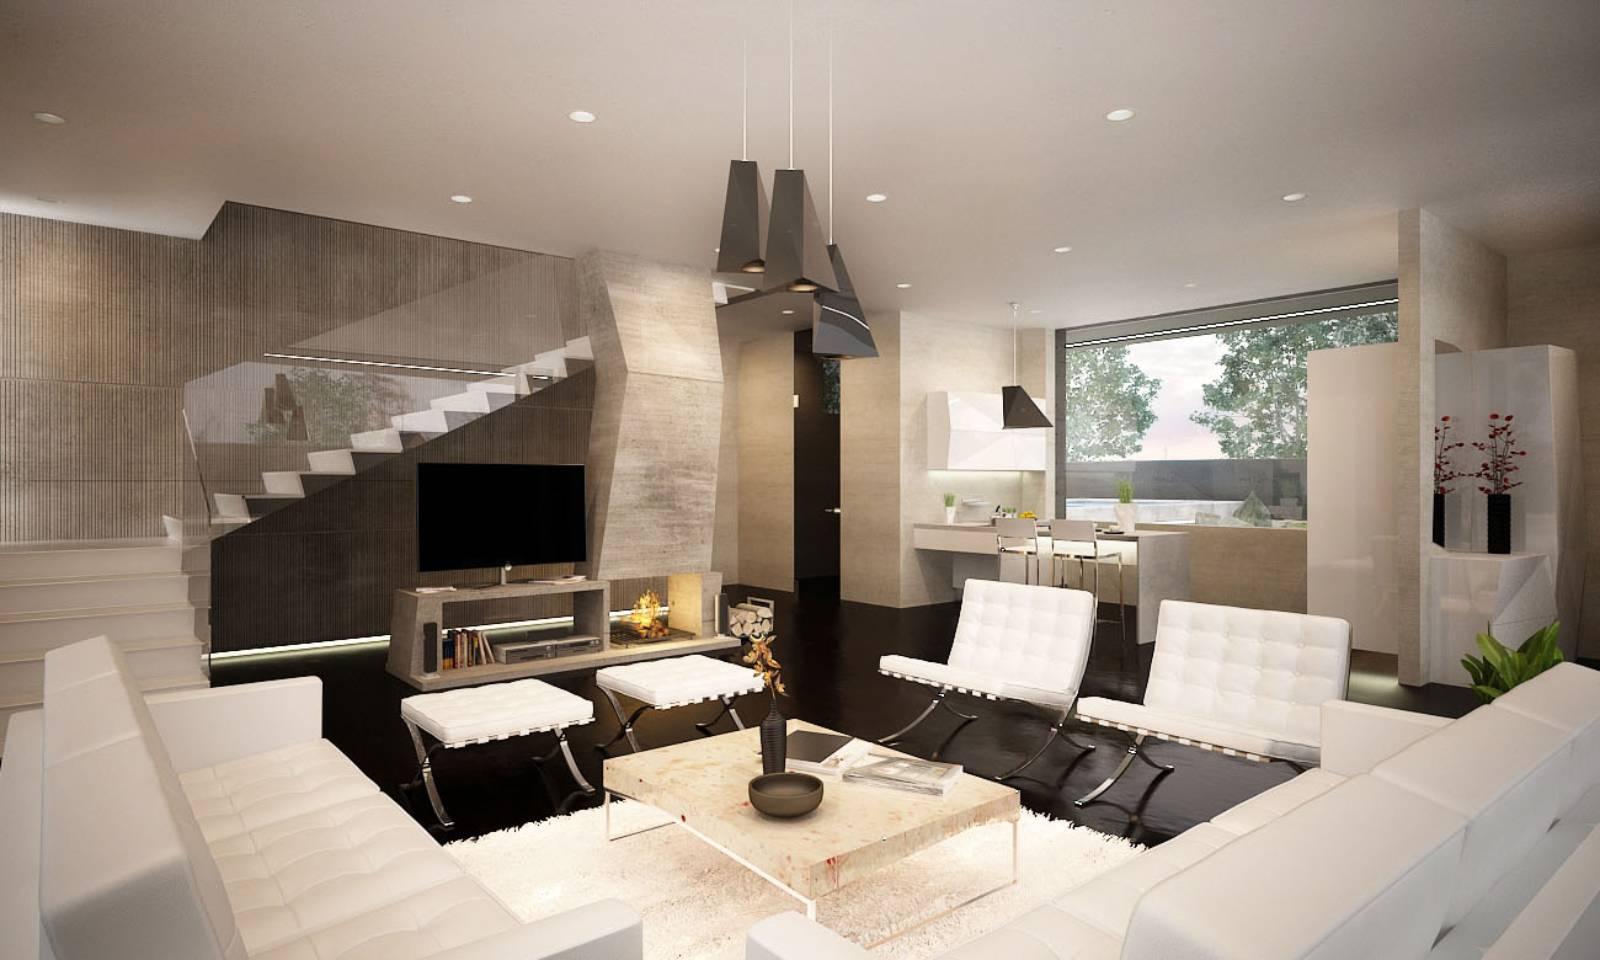 m house by marcel luchian studio - Arredamento Studio Moderno